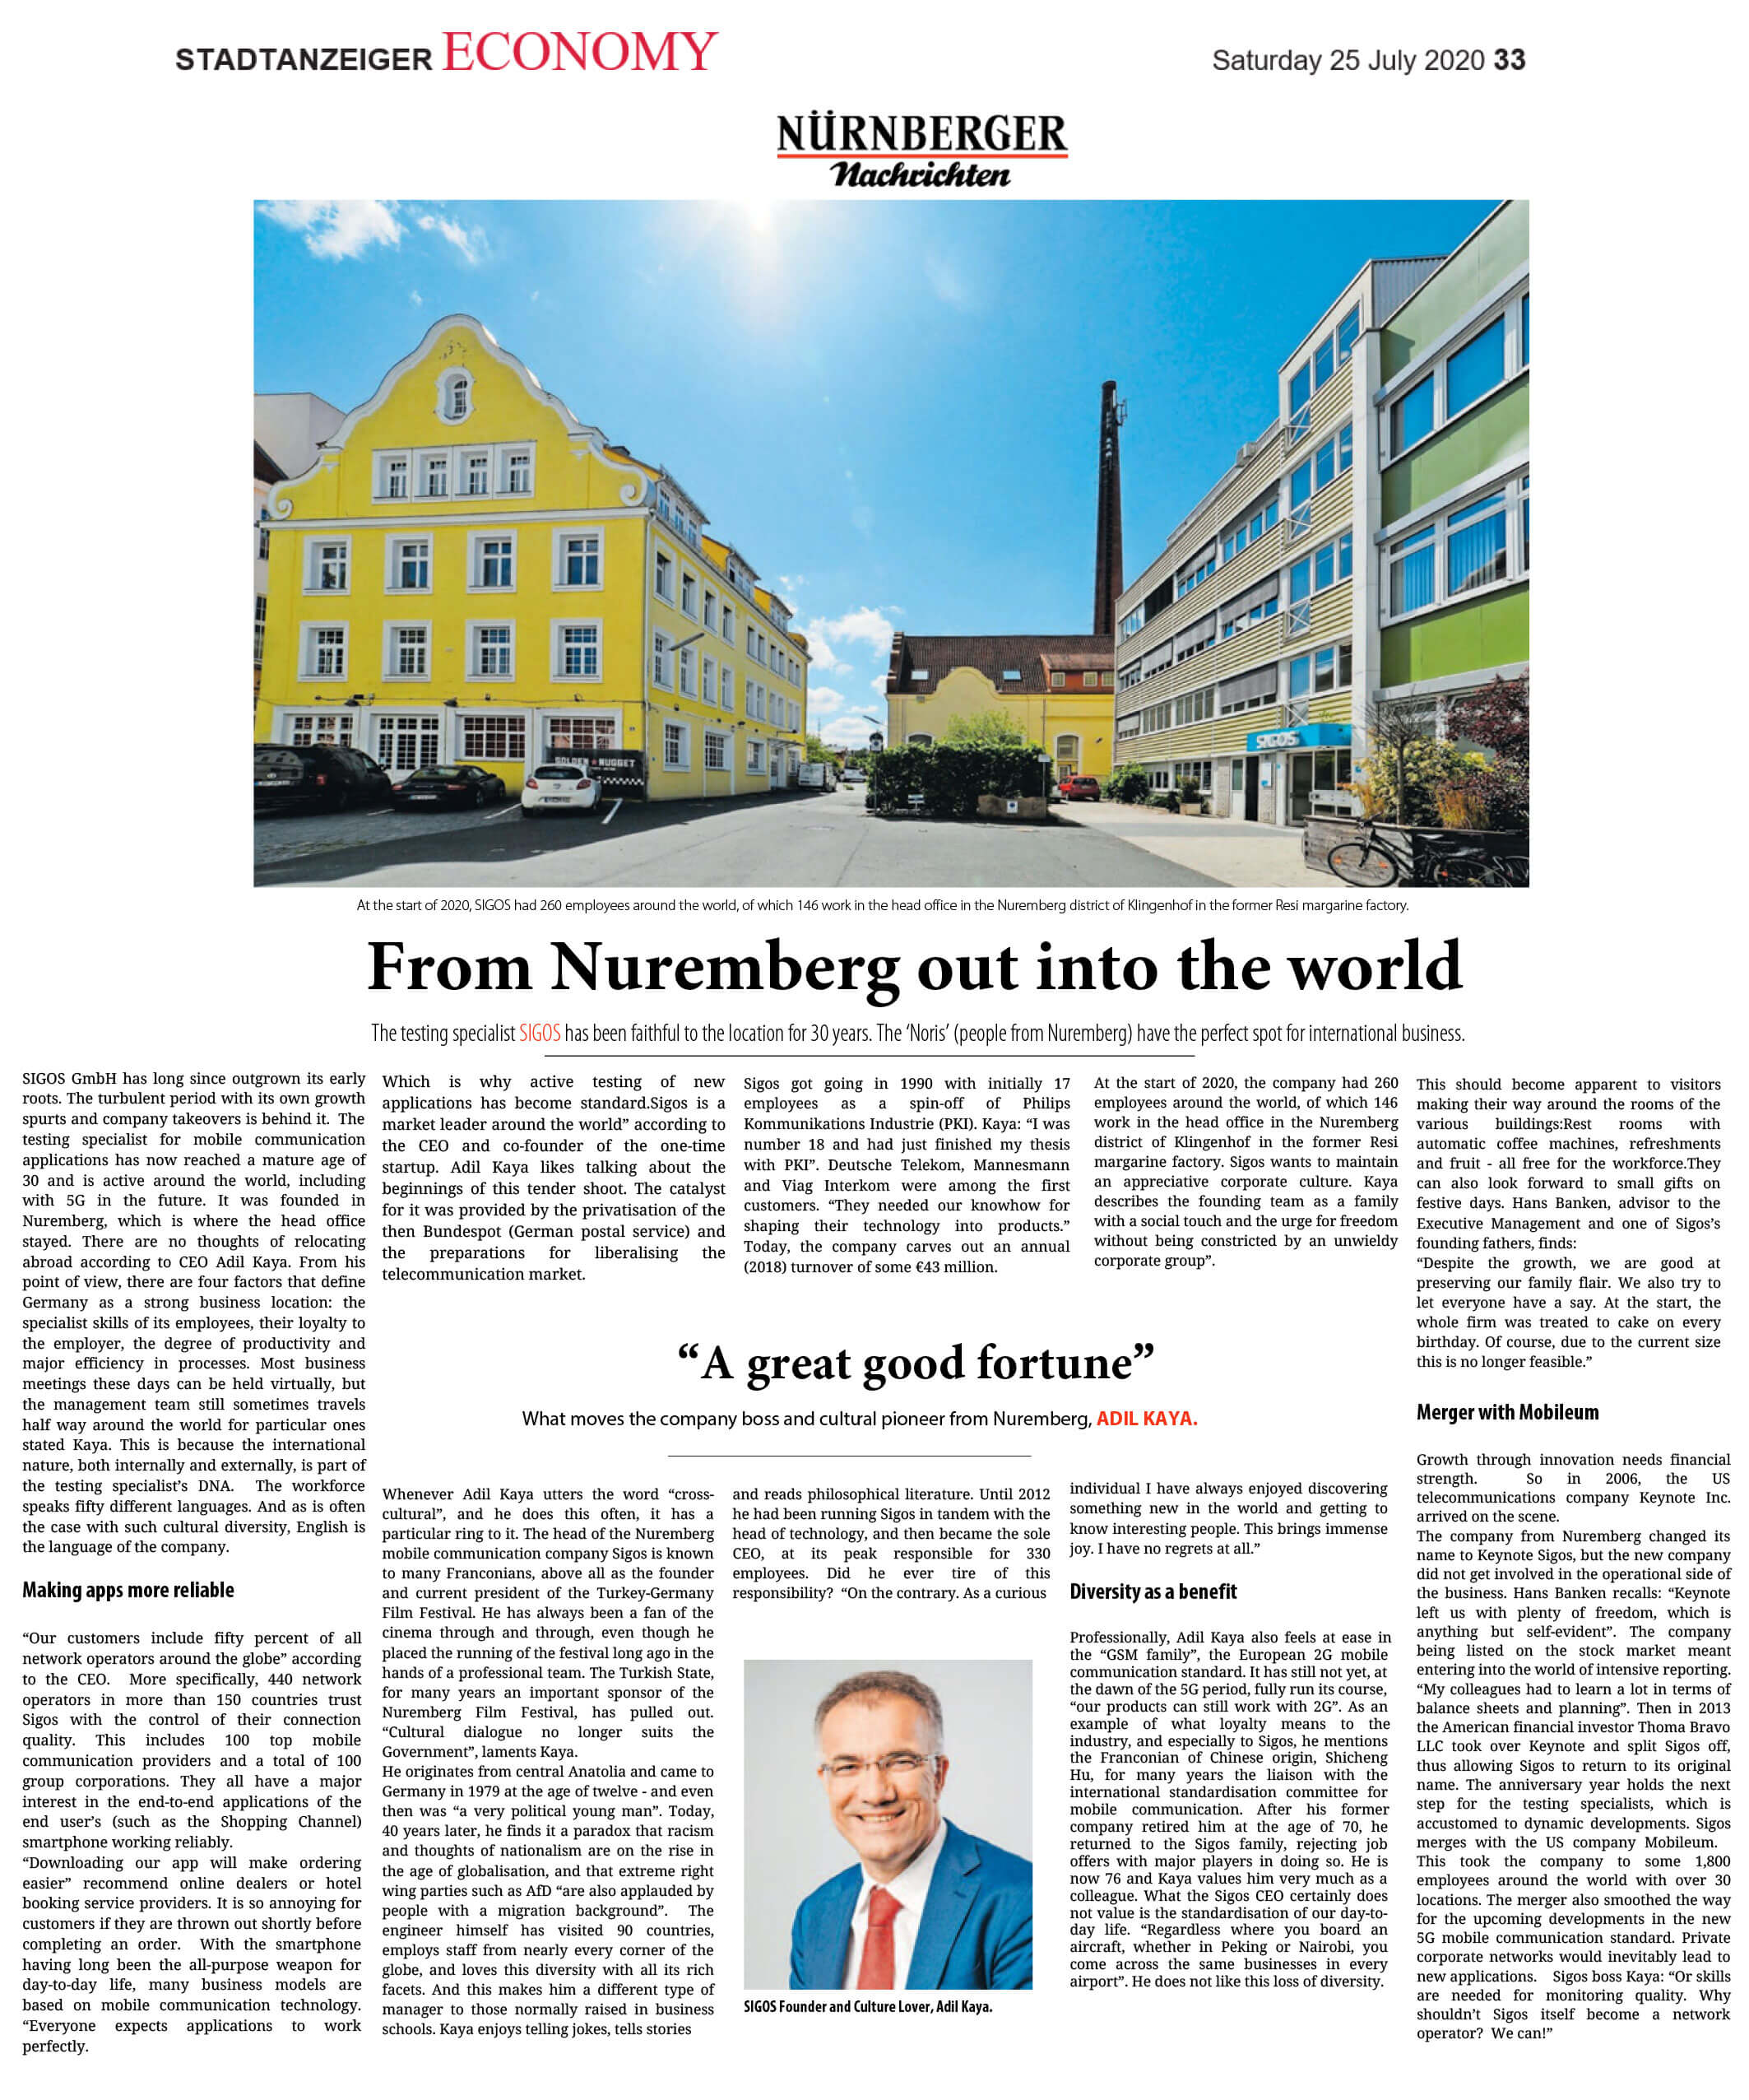 Newspaper Nuernberger Nachrichten SIGOS Adil Kaya From Nuremberg out into the world - Diversity as a benefıt - 25-07-2020